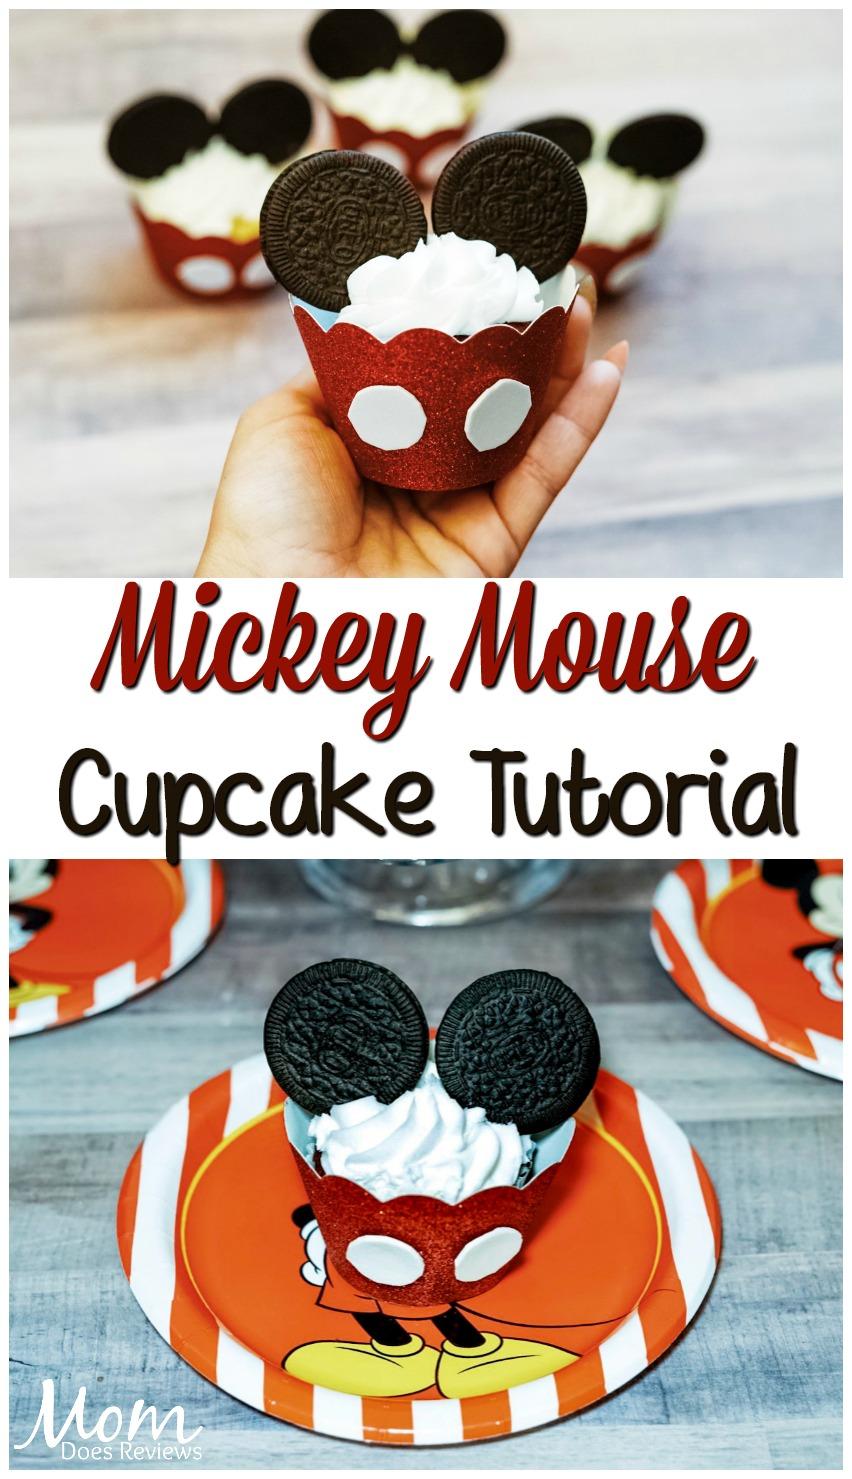 Mickey Mouse Cupcake Tutorial! #disney #cupcakes #food #birthdayparty #mickeymouse #yummy